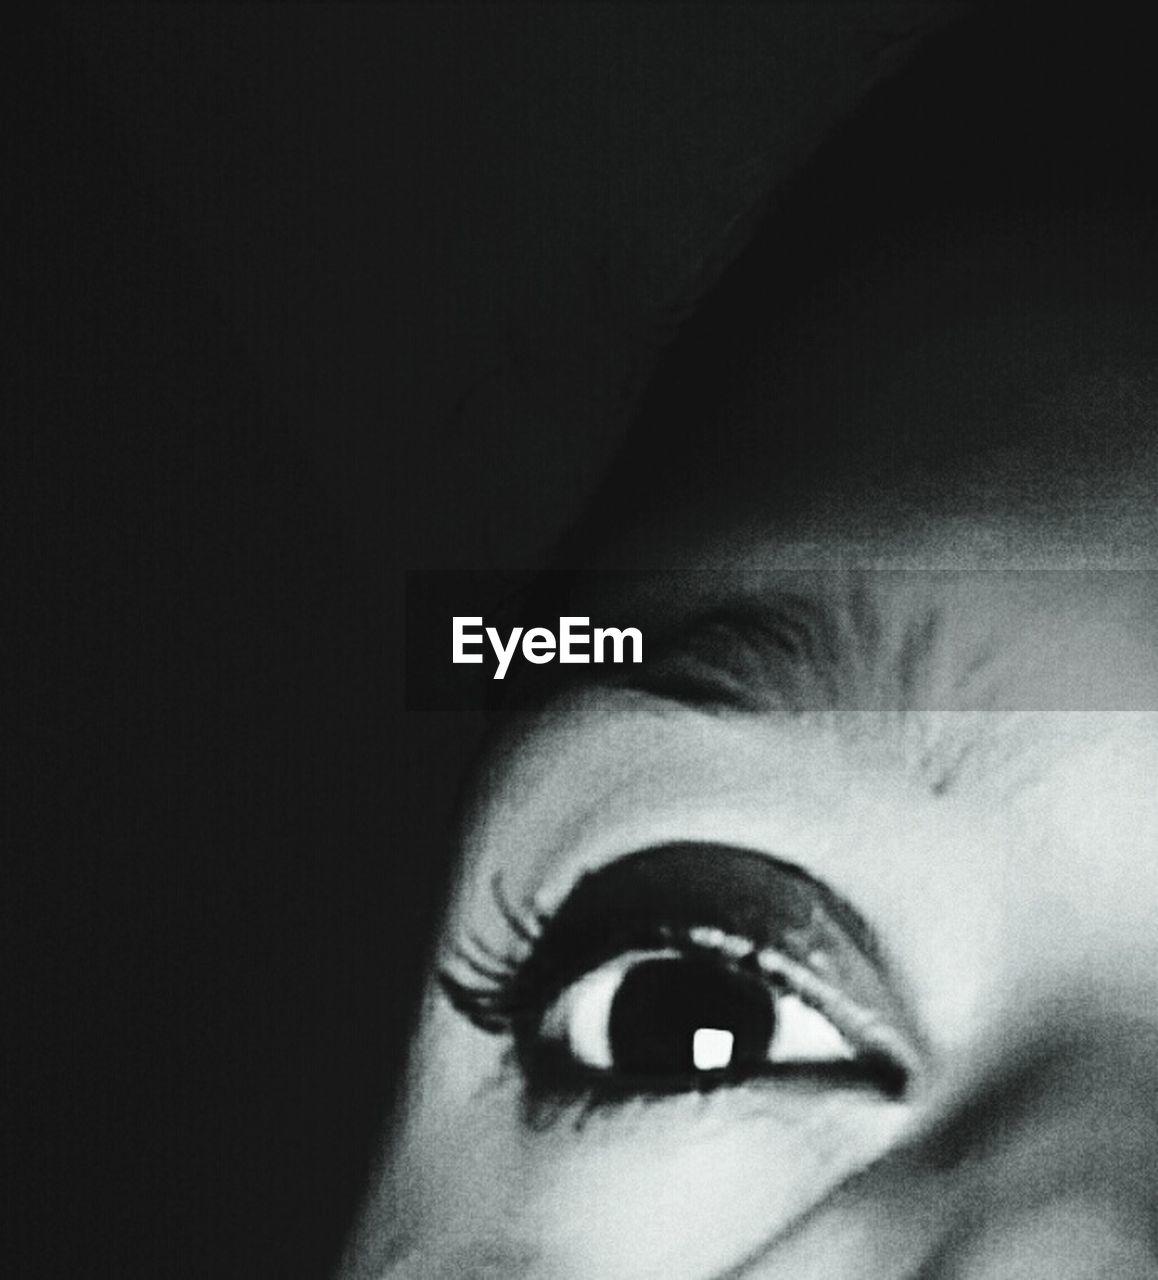 human eye, one person, real people, human body part, eyelash, close-up, looking at camera, indoors, eyeball, young women, eyebrow, eyesight, sensory perception, young adult, portrait, iris - eye, black background, day, people